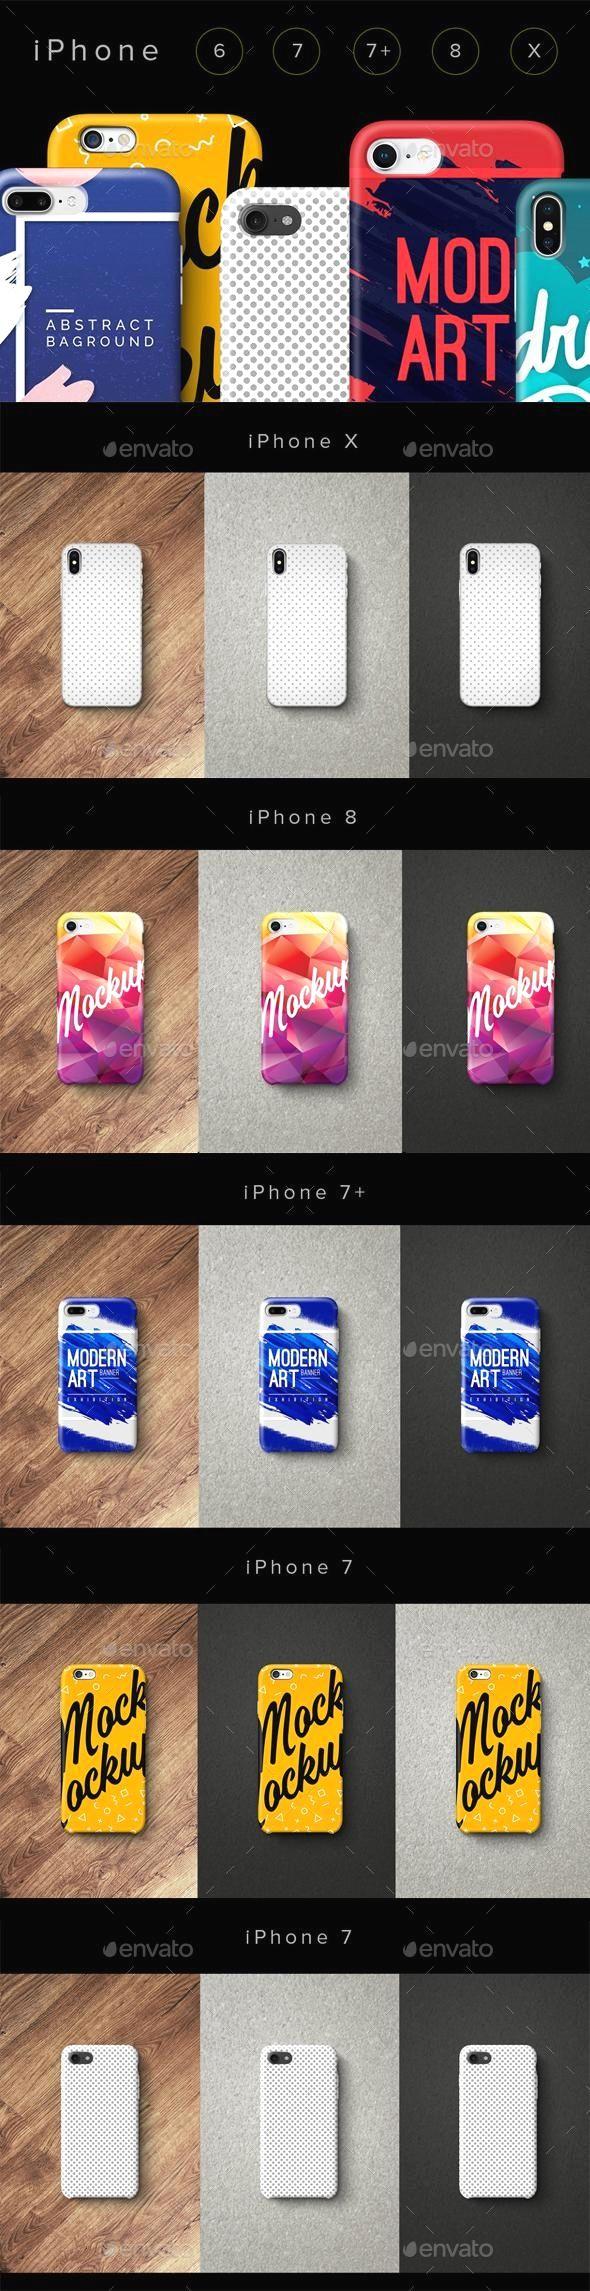 Сases Phone 6, 7, 7plus, 8, X Set Mockup design, Display